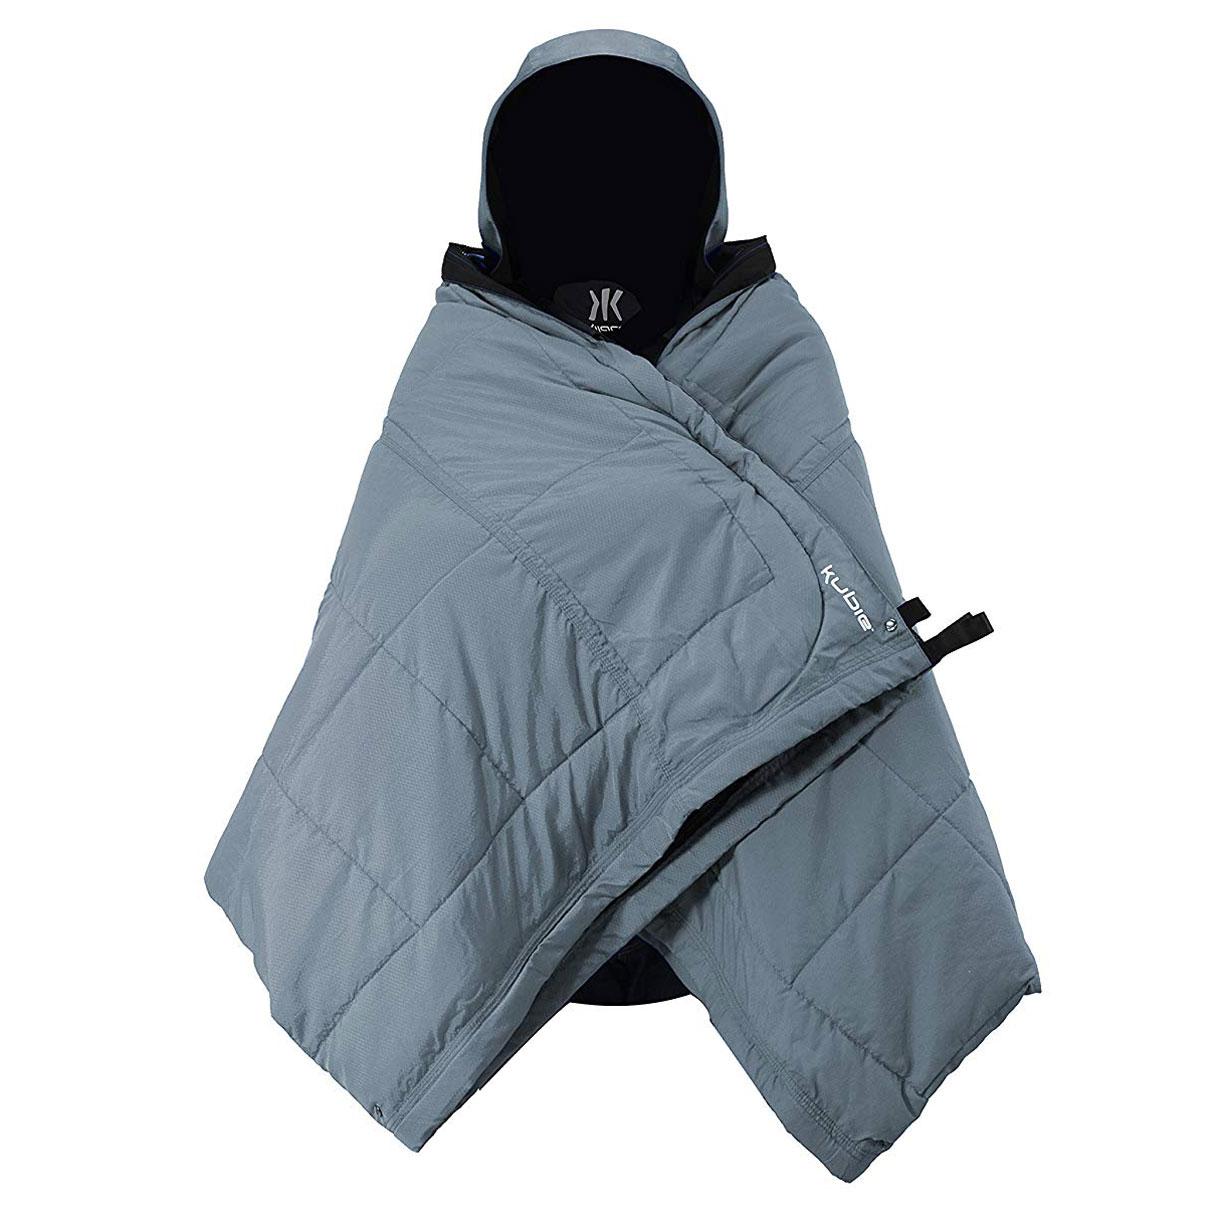 Poncho, Hammock, Blanket, Sleeping Bag